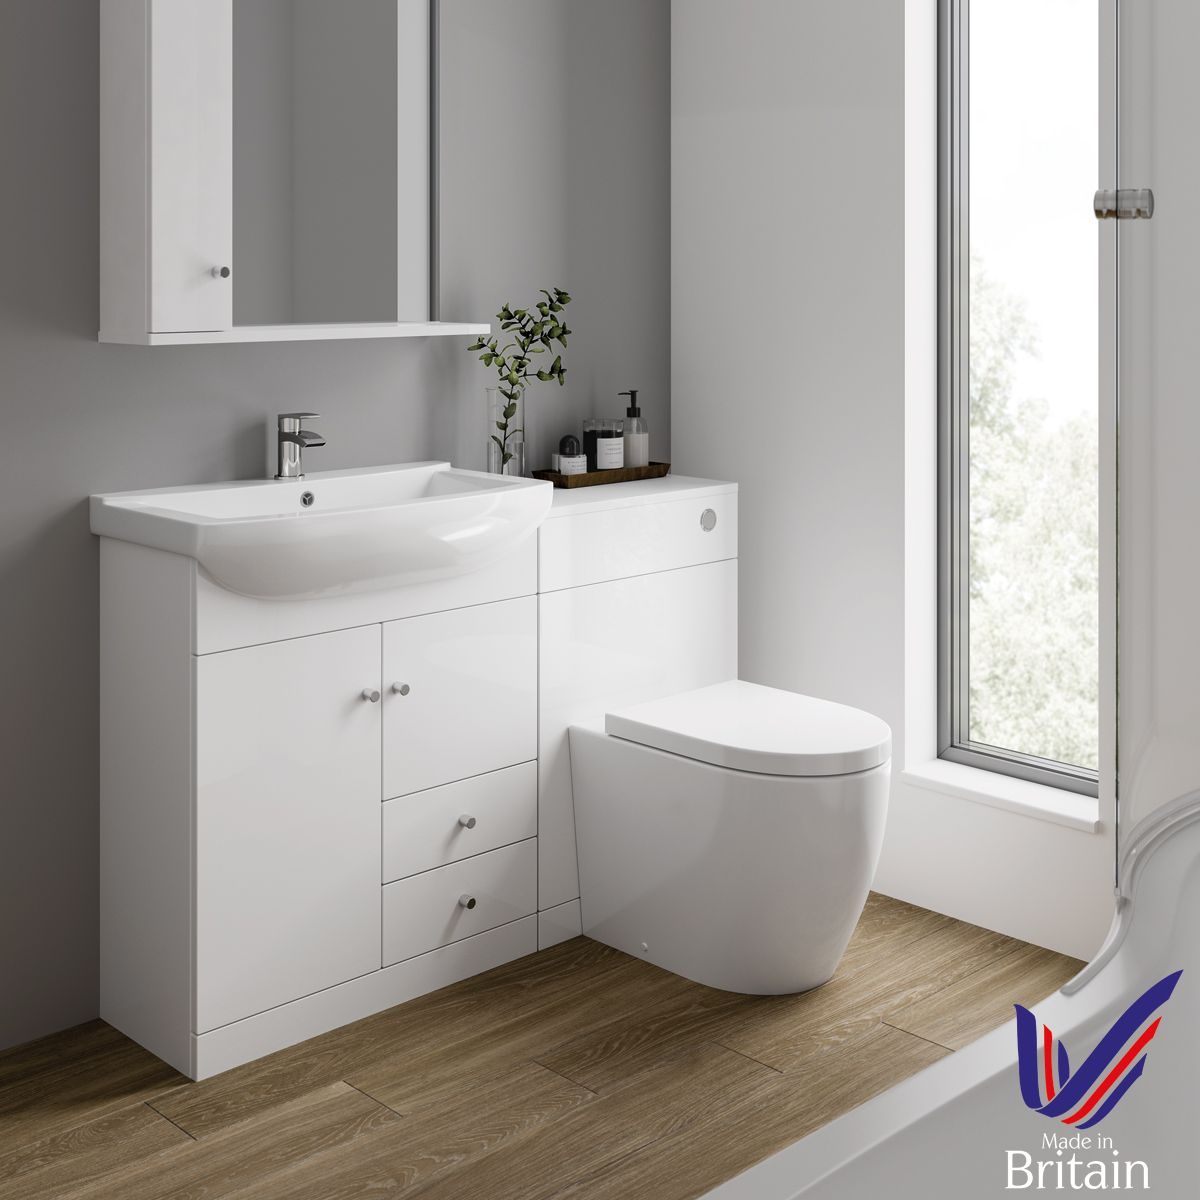 Ikoma White Gloss Vanity Unit with Basin 750mm Lifestyle